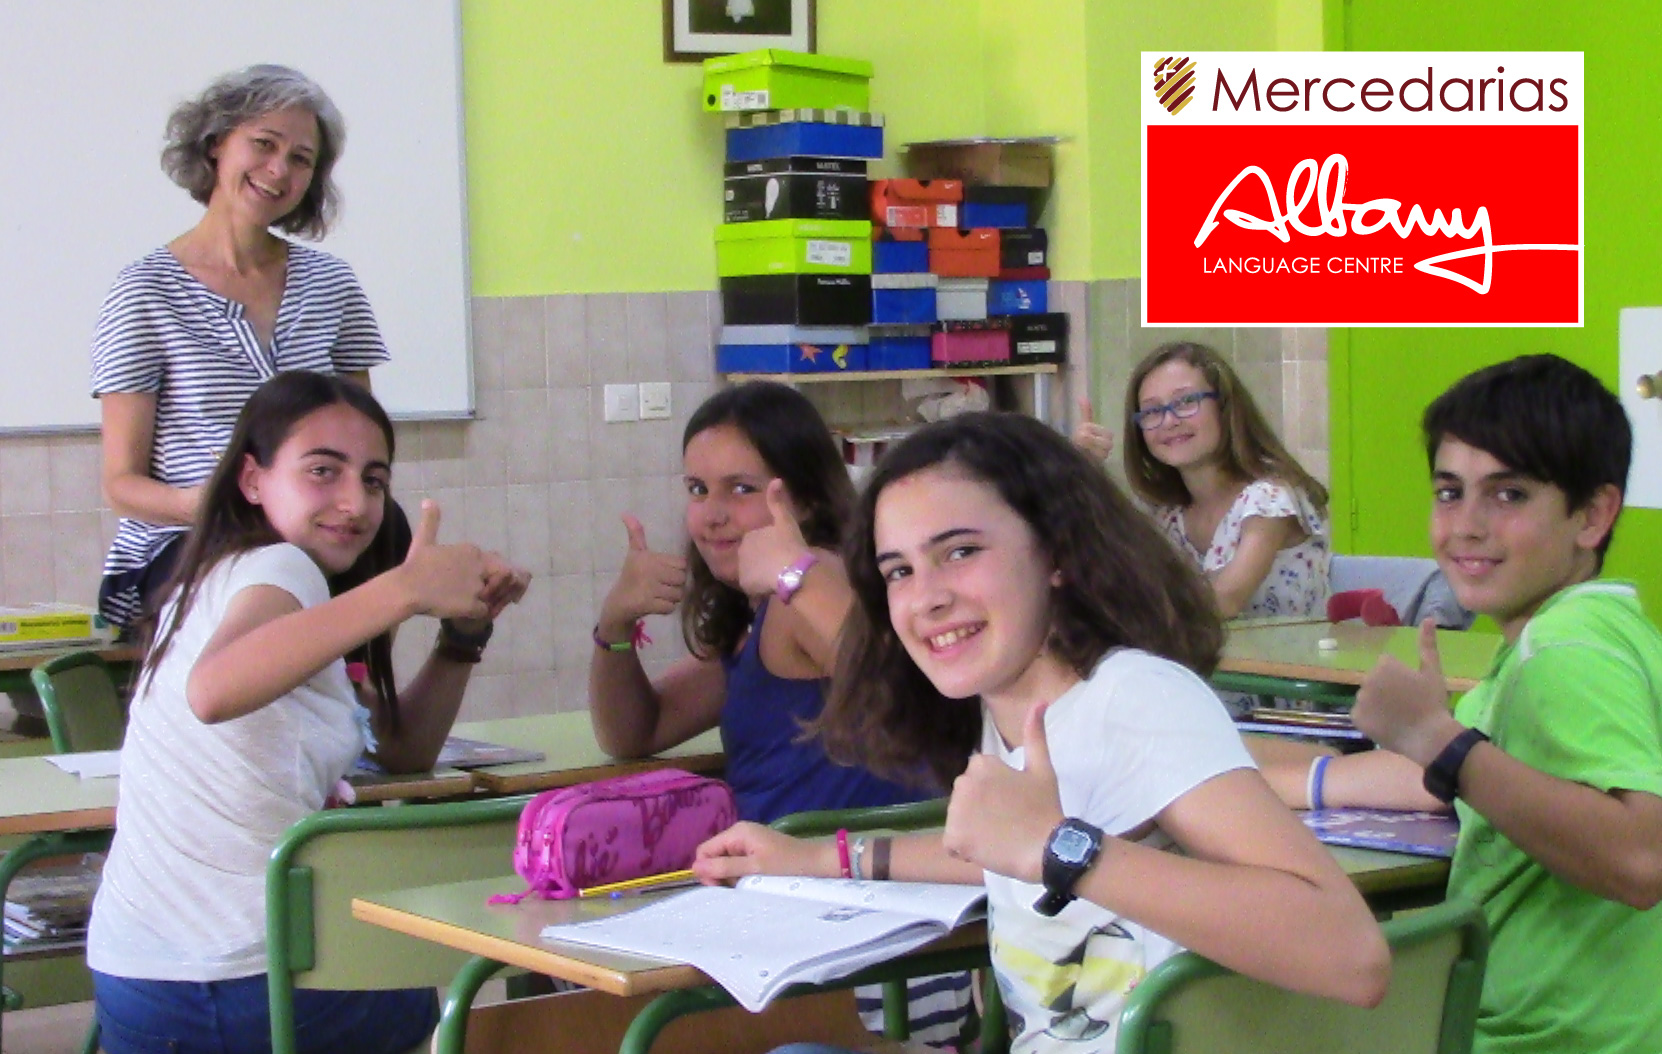 Mercedarias